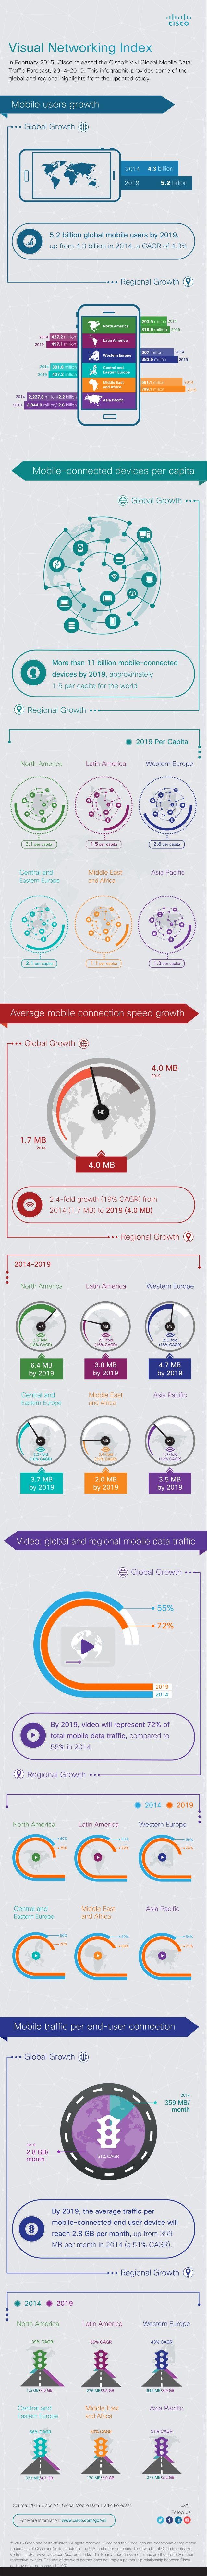 Cisco Visual Networking Index (VNI) Global Mobile Data Traffic Forecast, 2014-2019